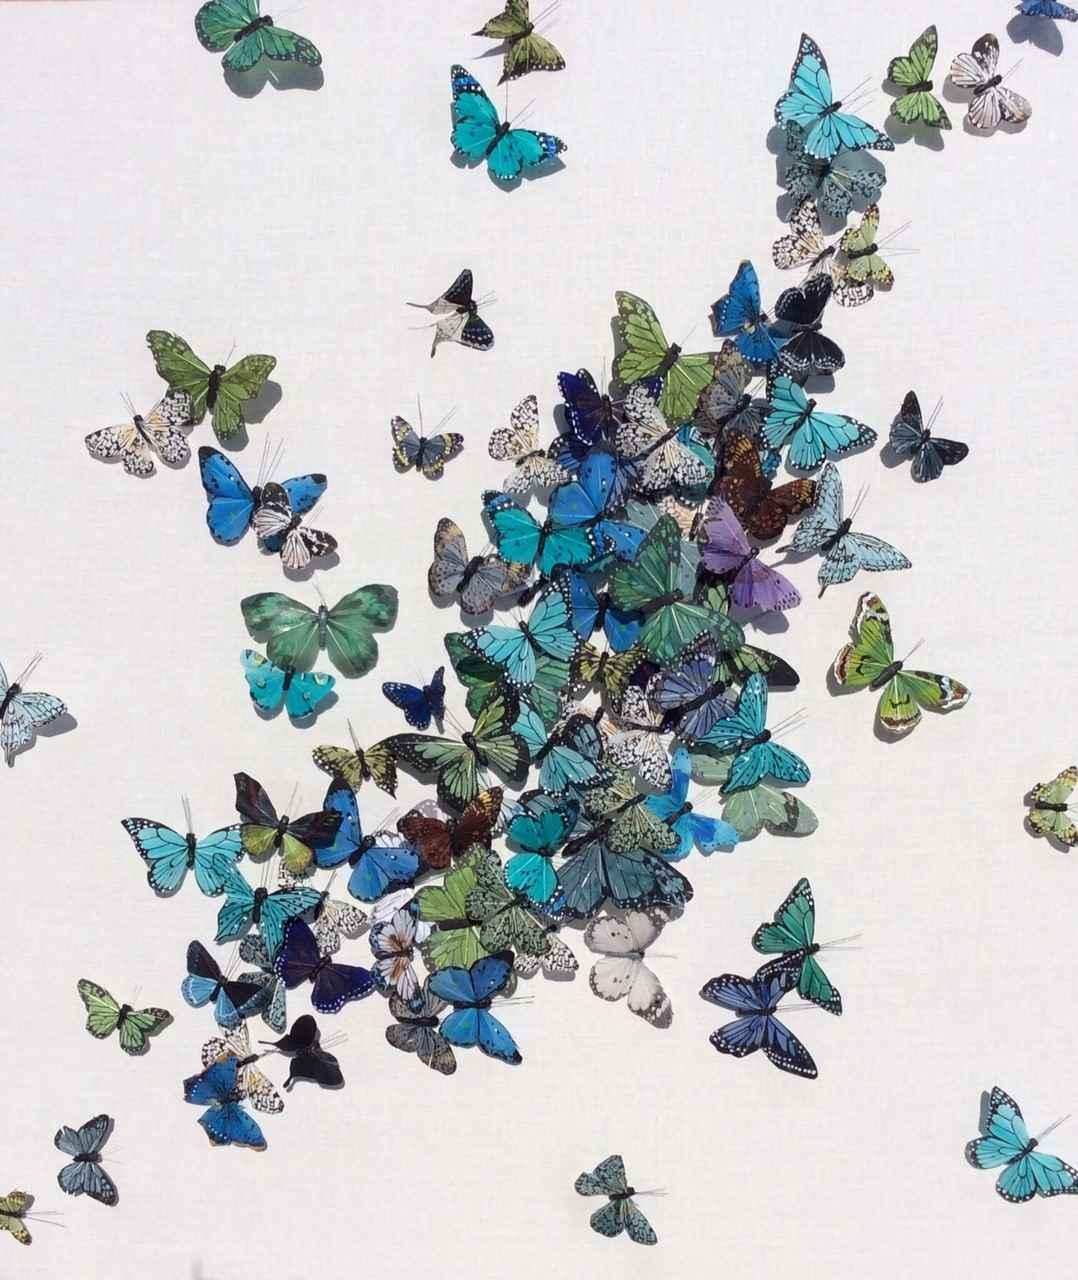 Flight Over Parry Sou... by  Juan Carlos Collada - Masterpiece Online